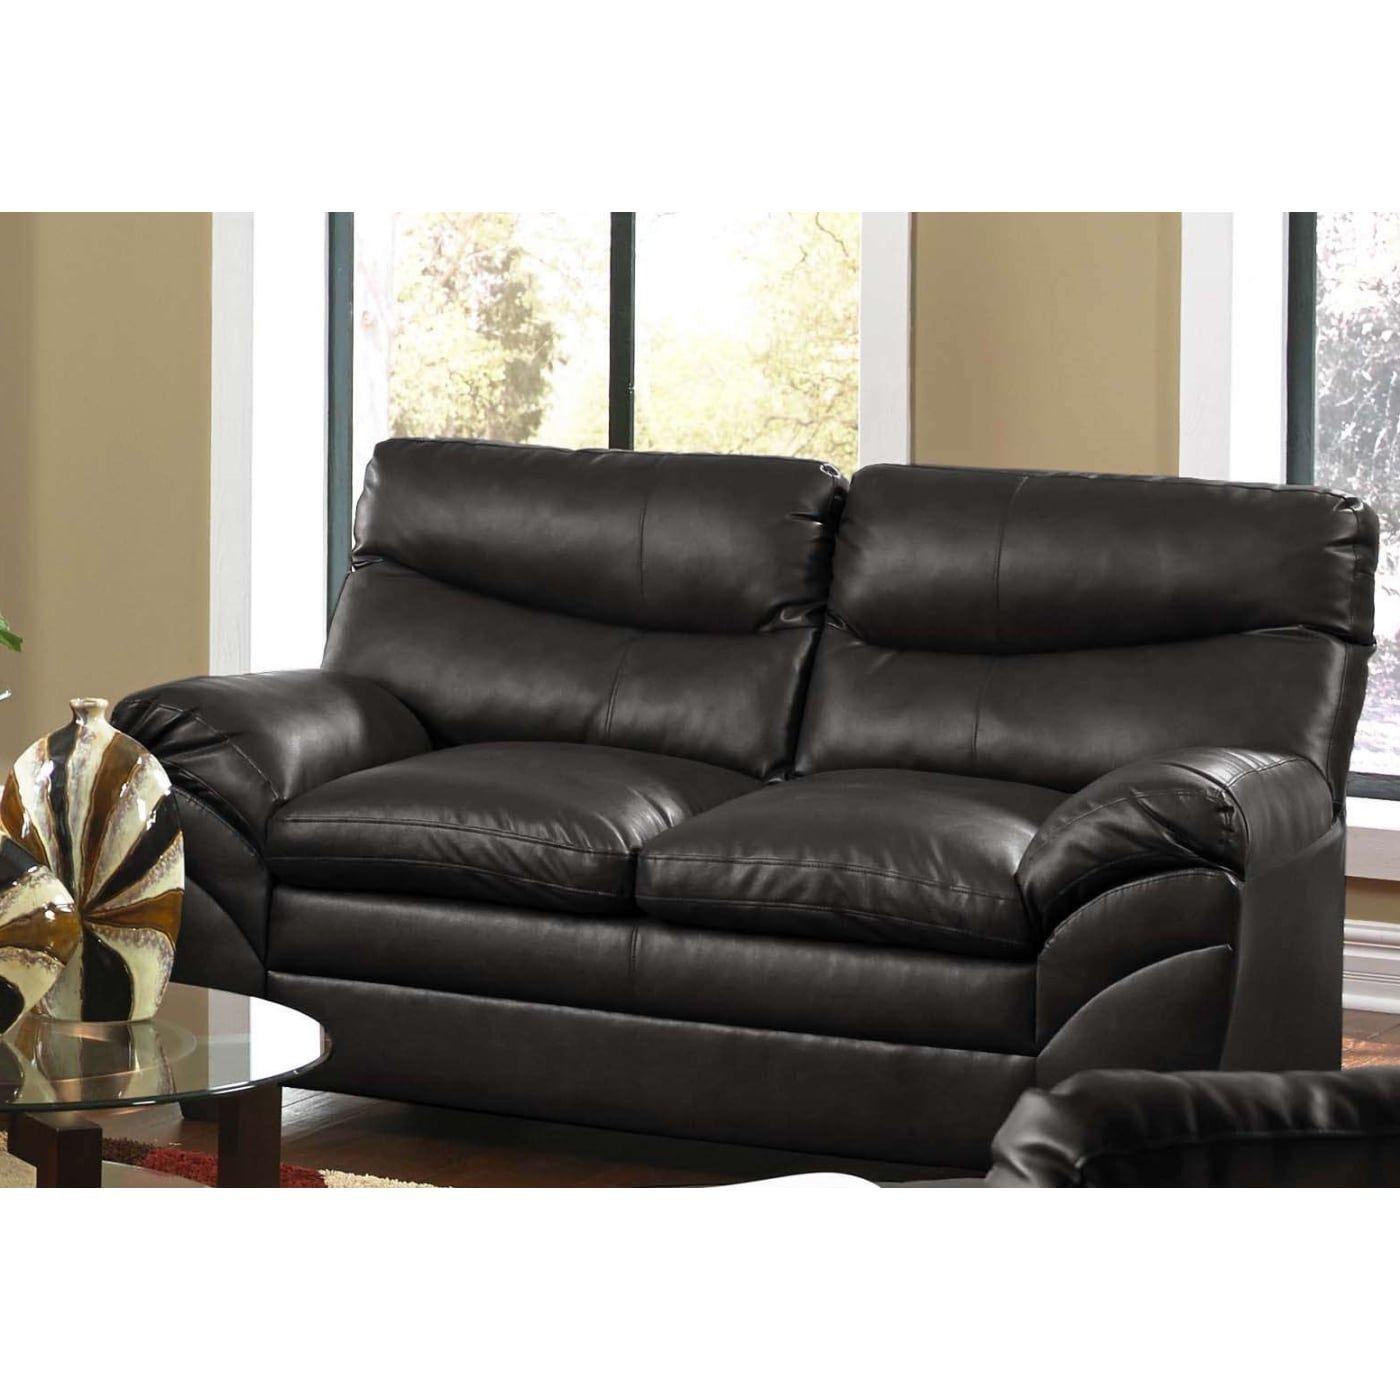 Simmons Upholstery 9515 02 Soho Onyx Leather Loveseat Buy